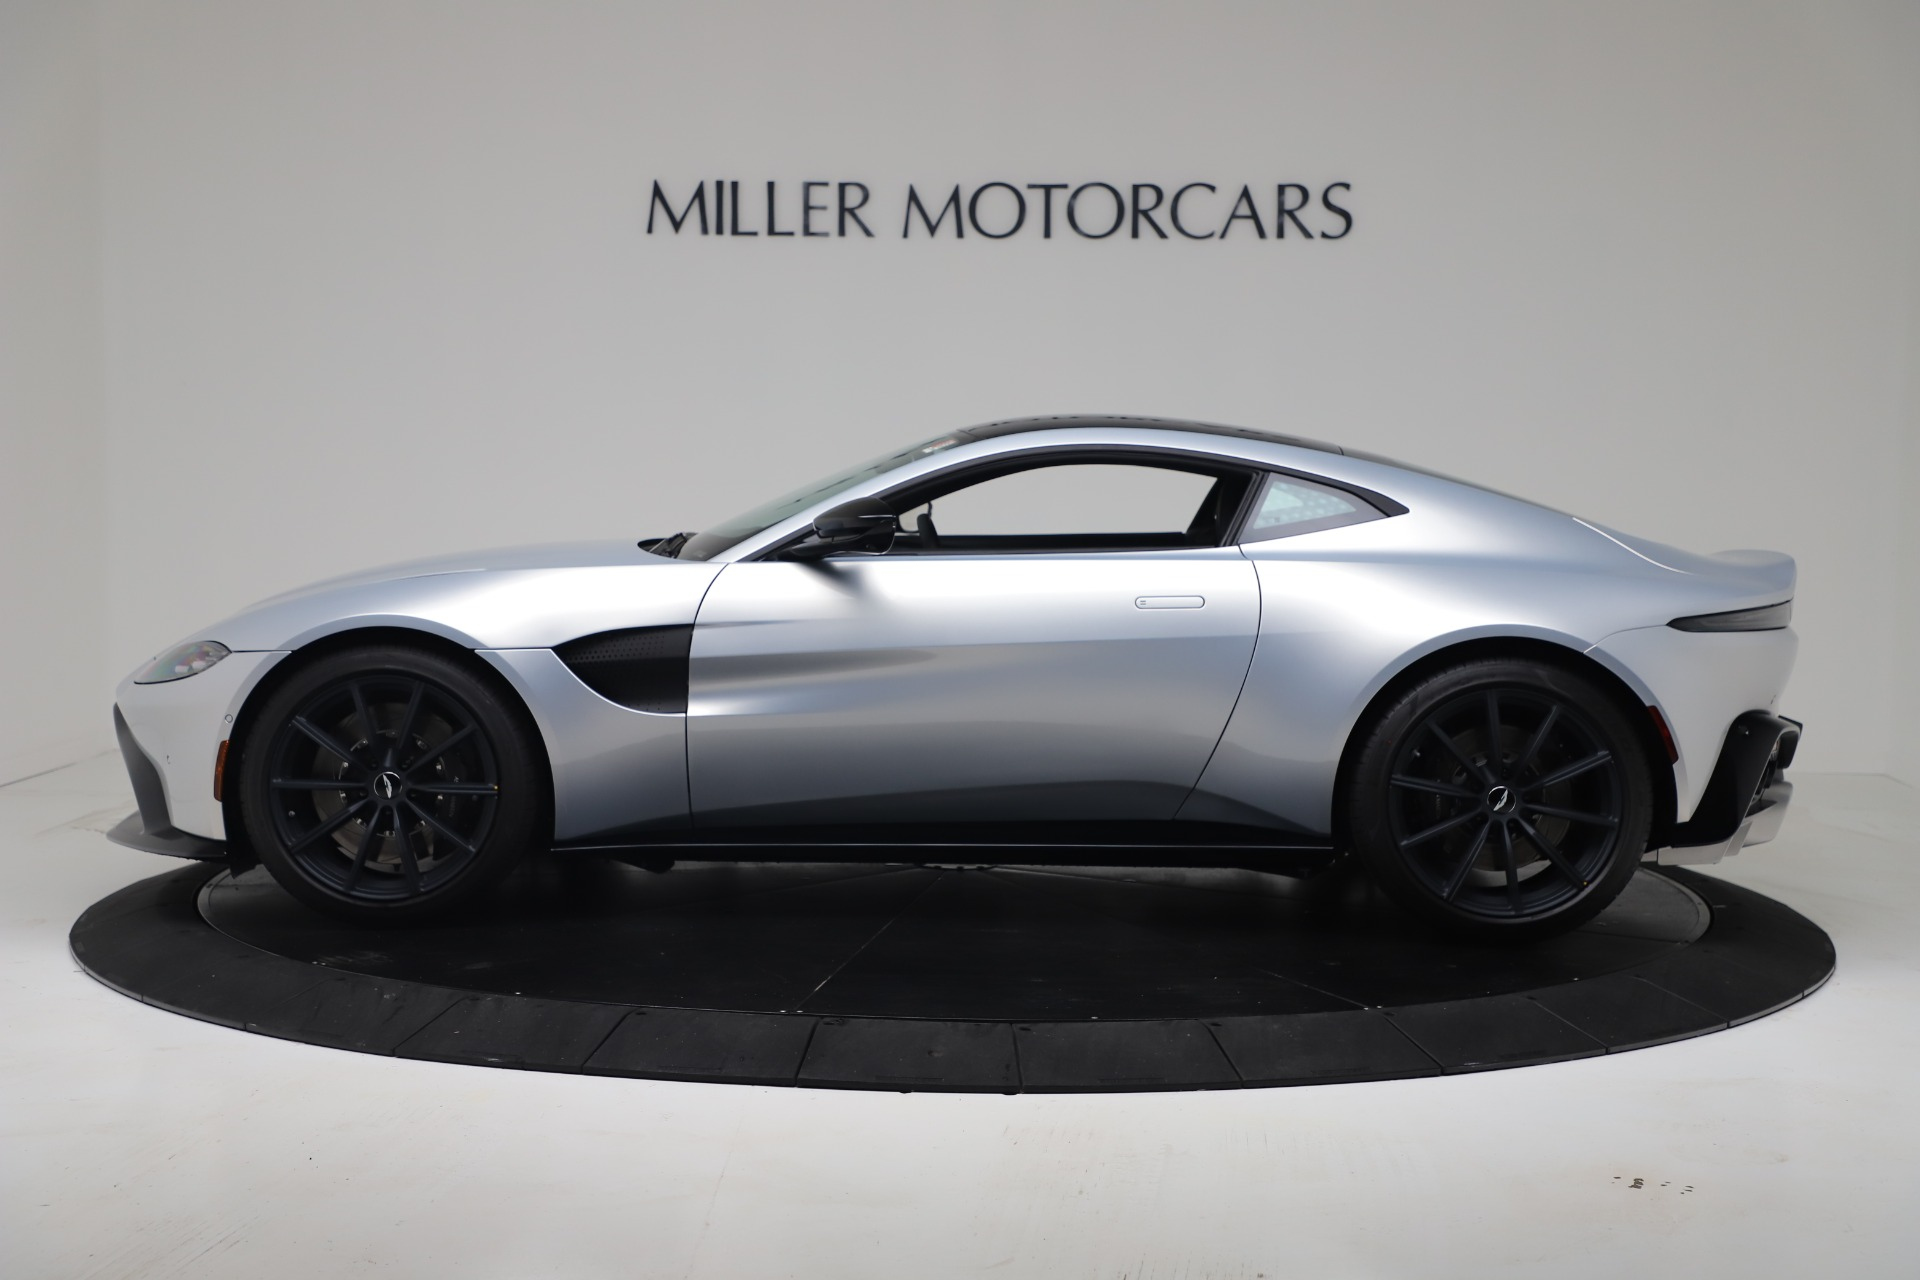 New 2020 Aston Martin Vantage V8 For Sale In Westport, CT 3481_p23